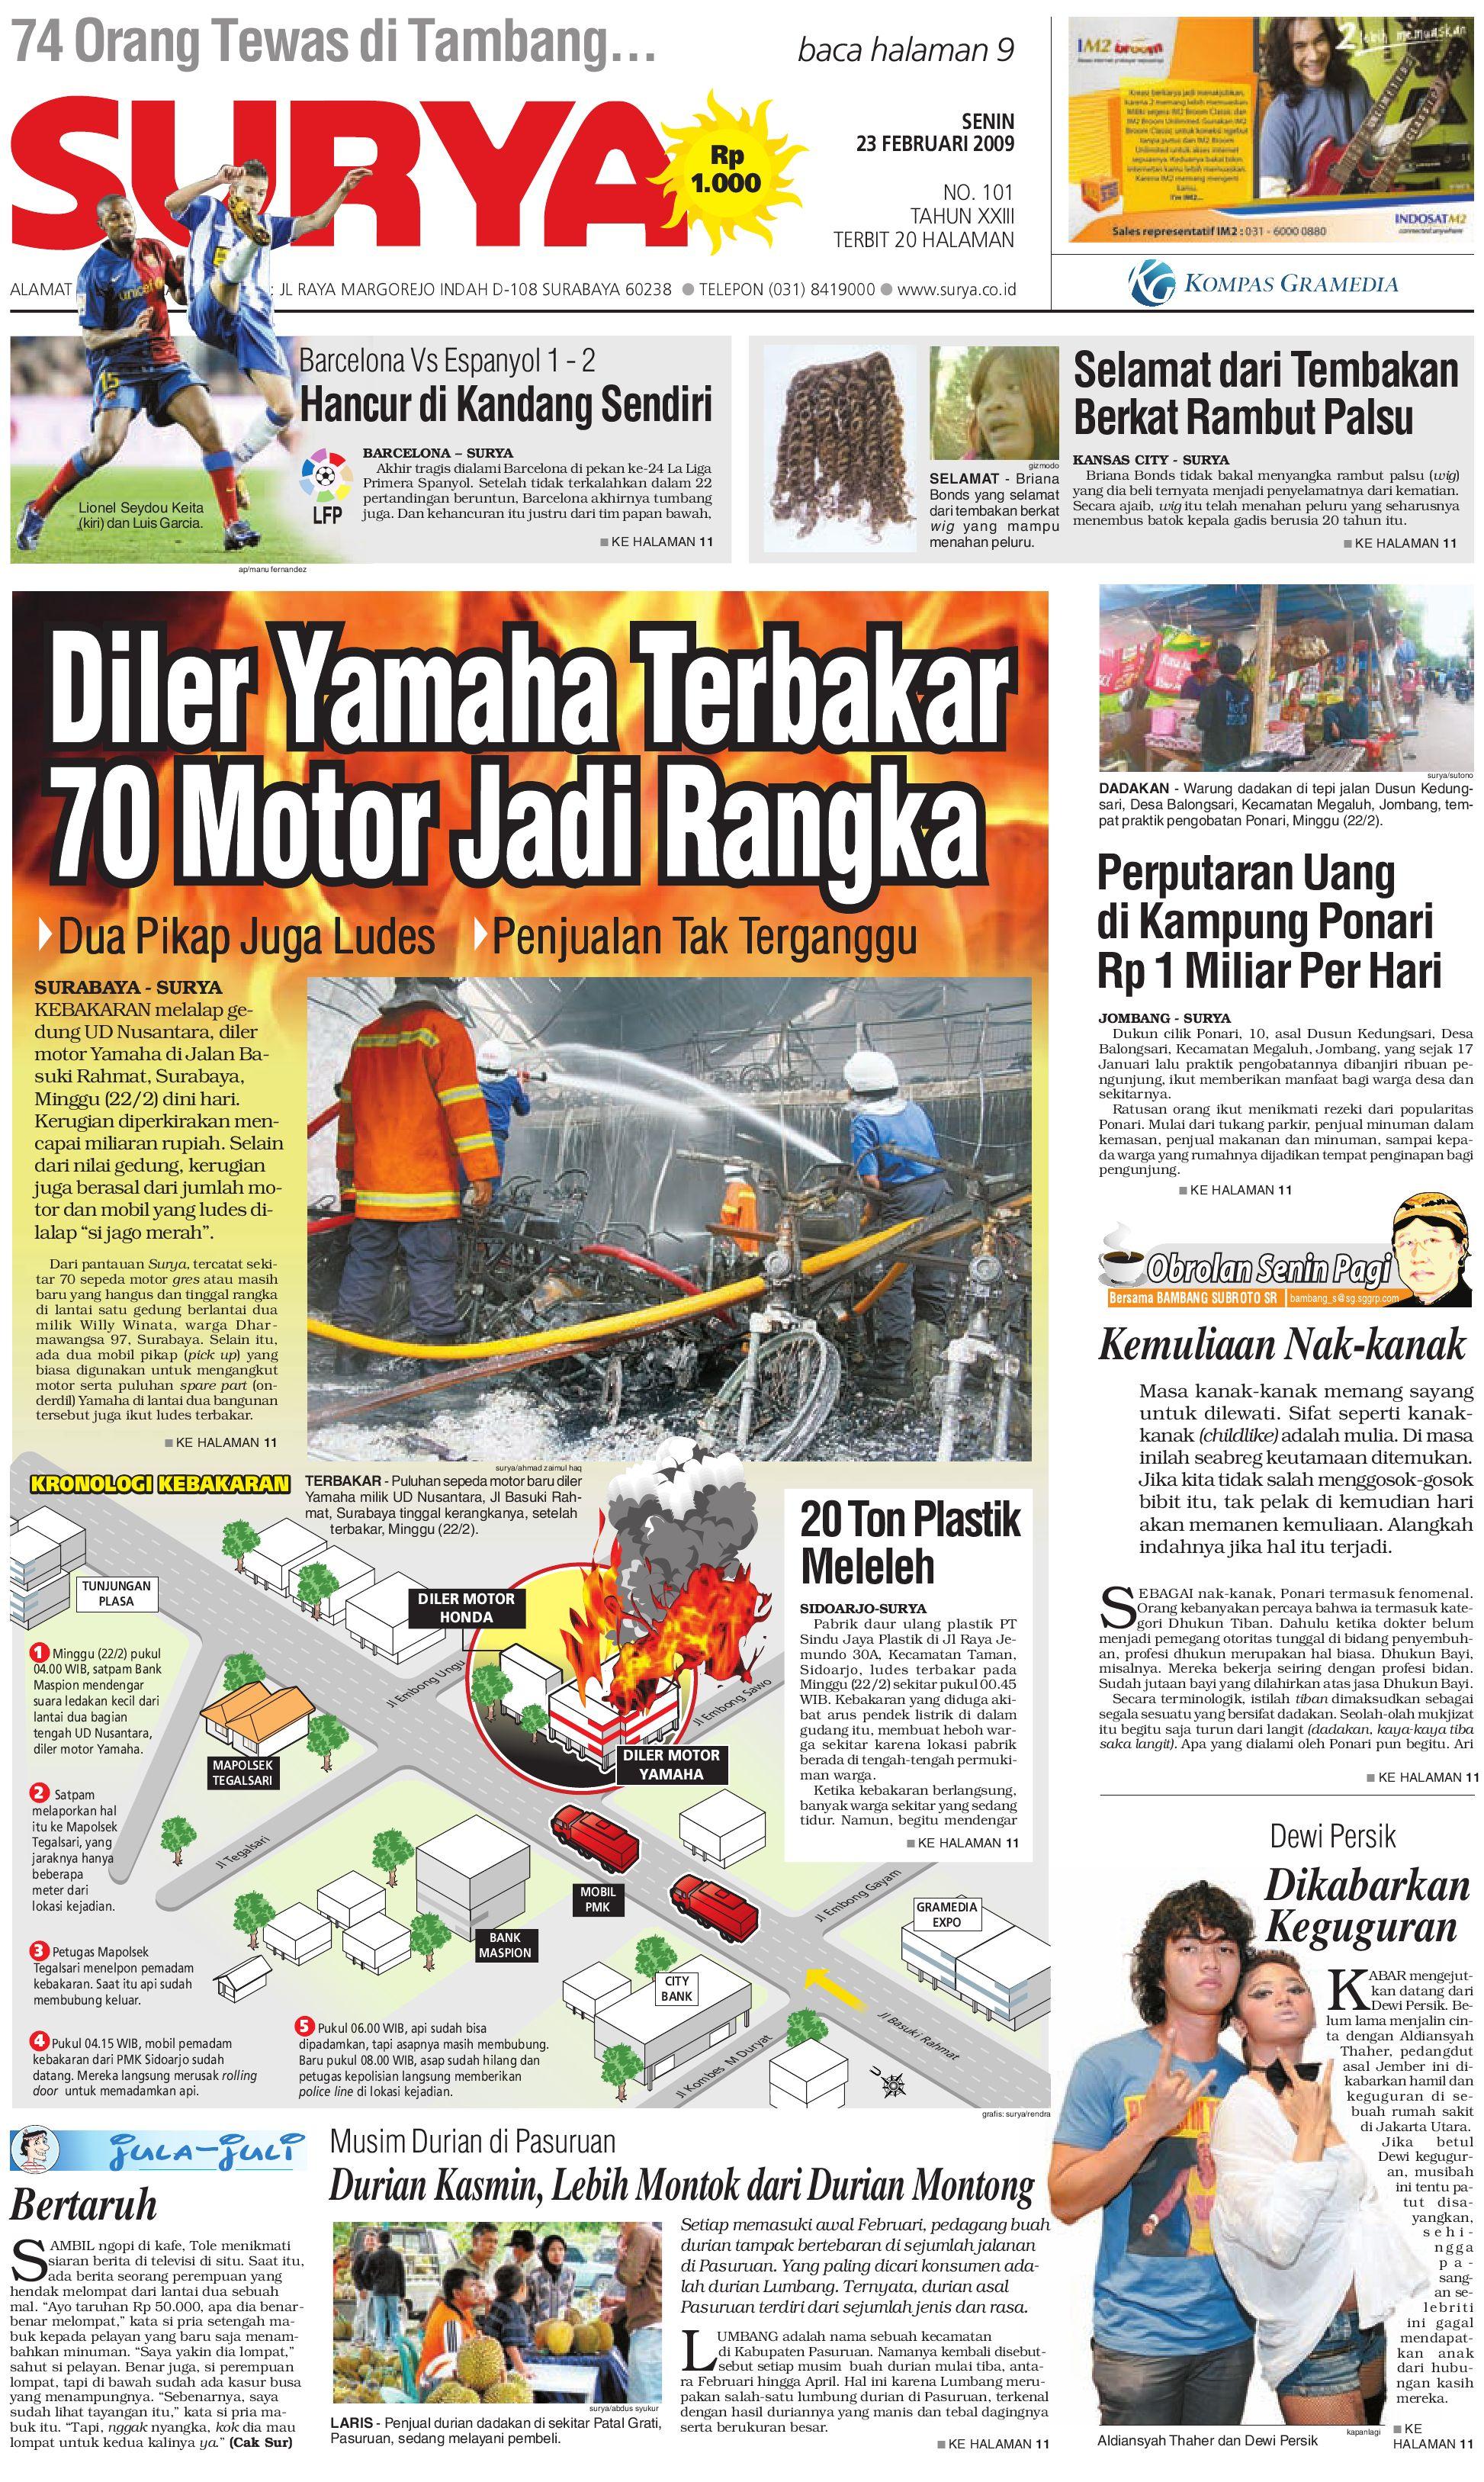 Surya Edisi Cetak 23 Februari 2009 by Harian SURYA - issuu 13fd3b2f15